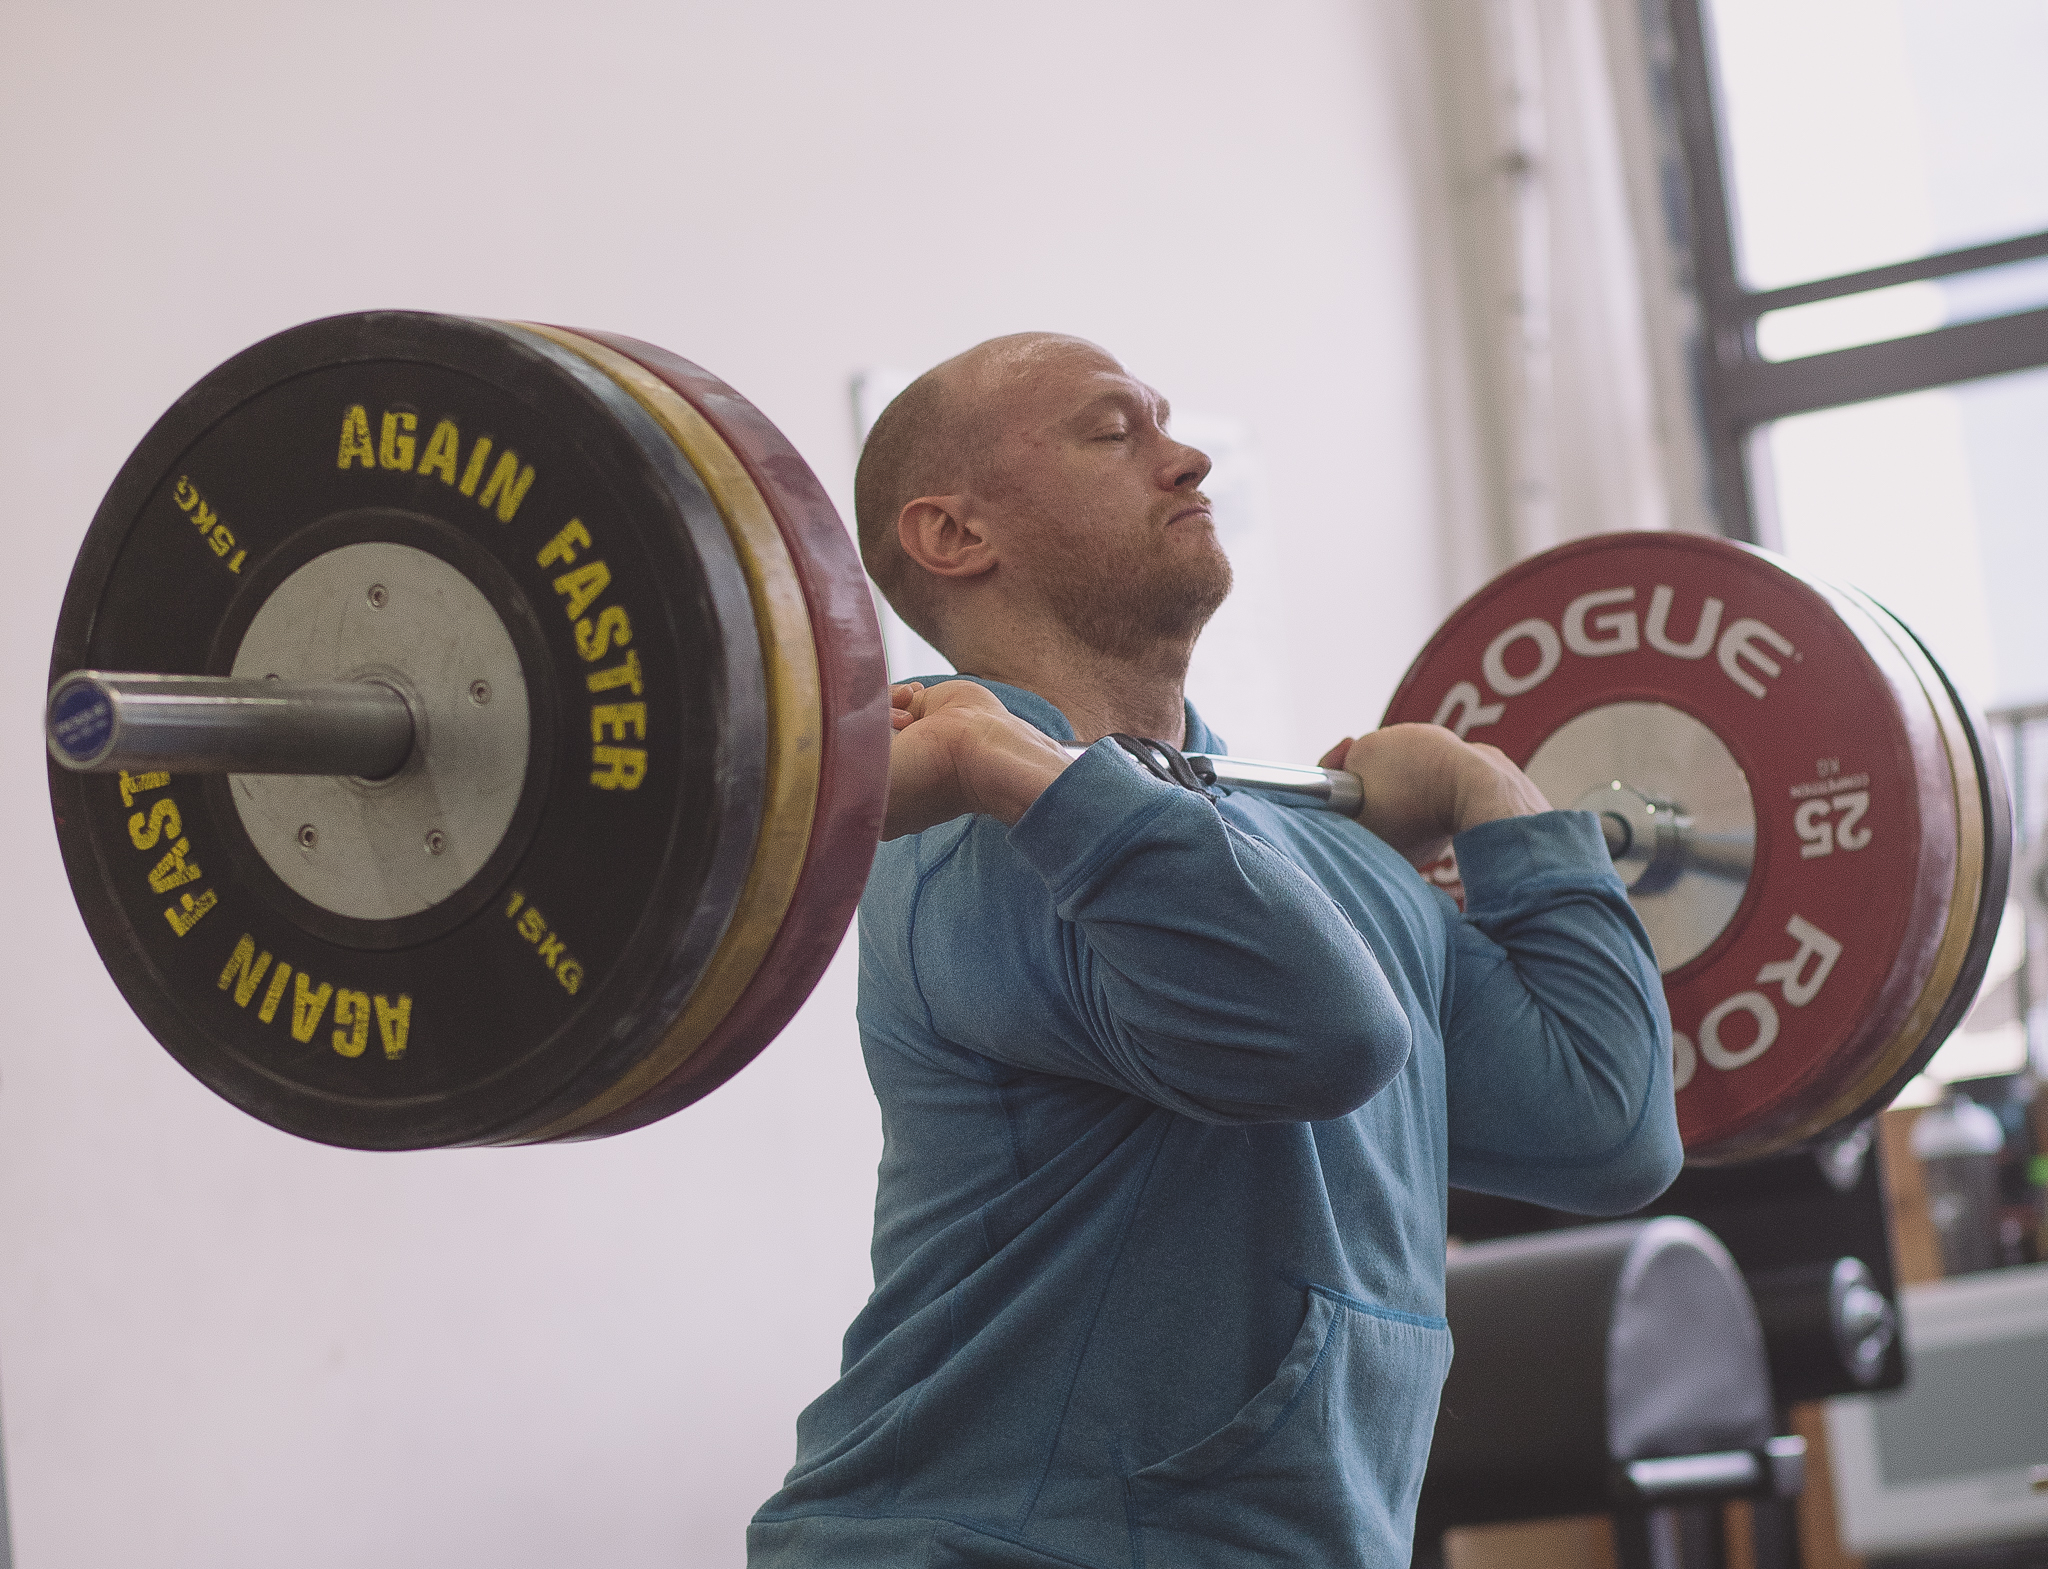 yasha-kahn-weightlifting-coach-8.jpg